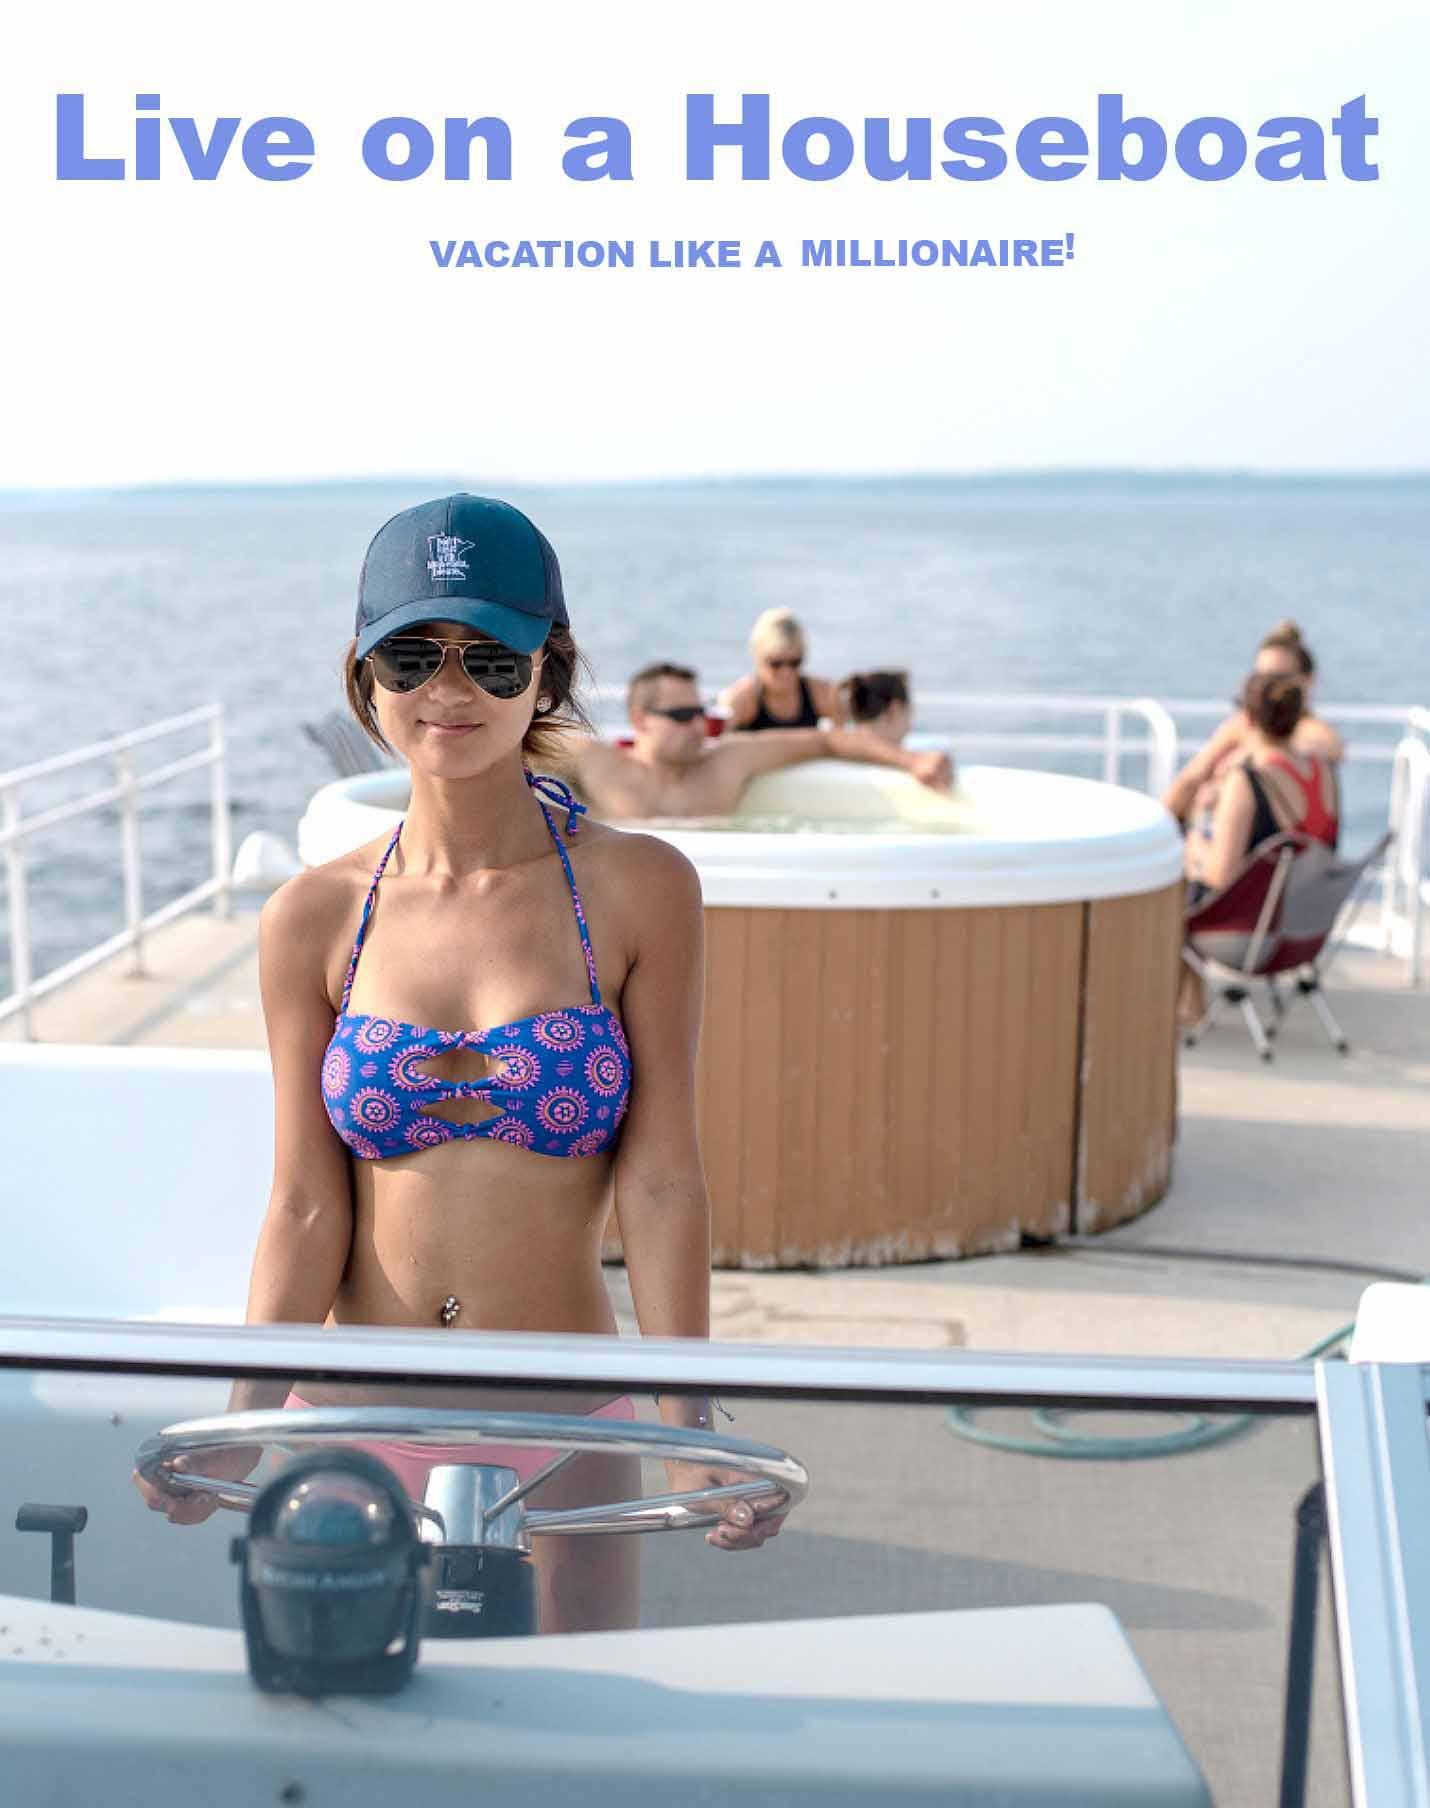 Vacation Like a Millionaire